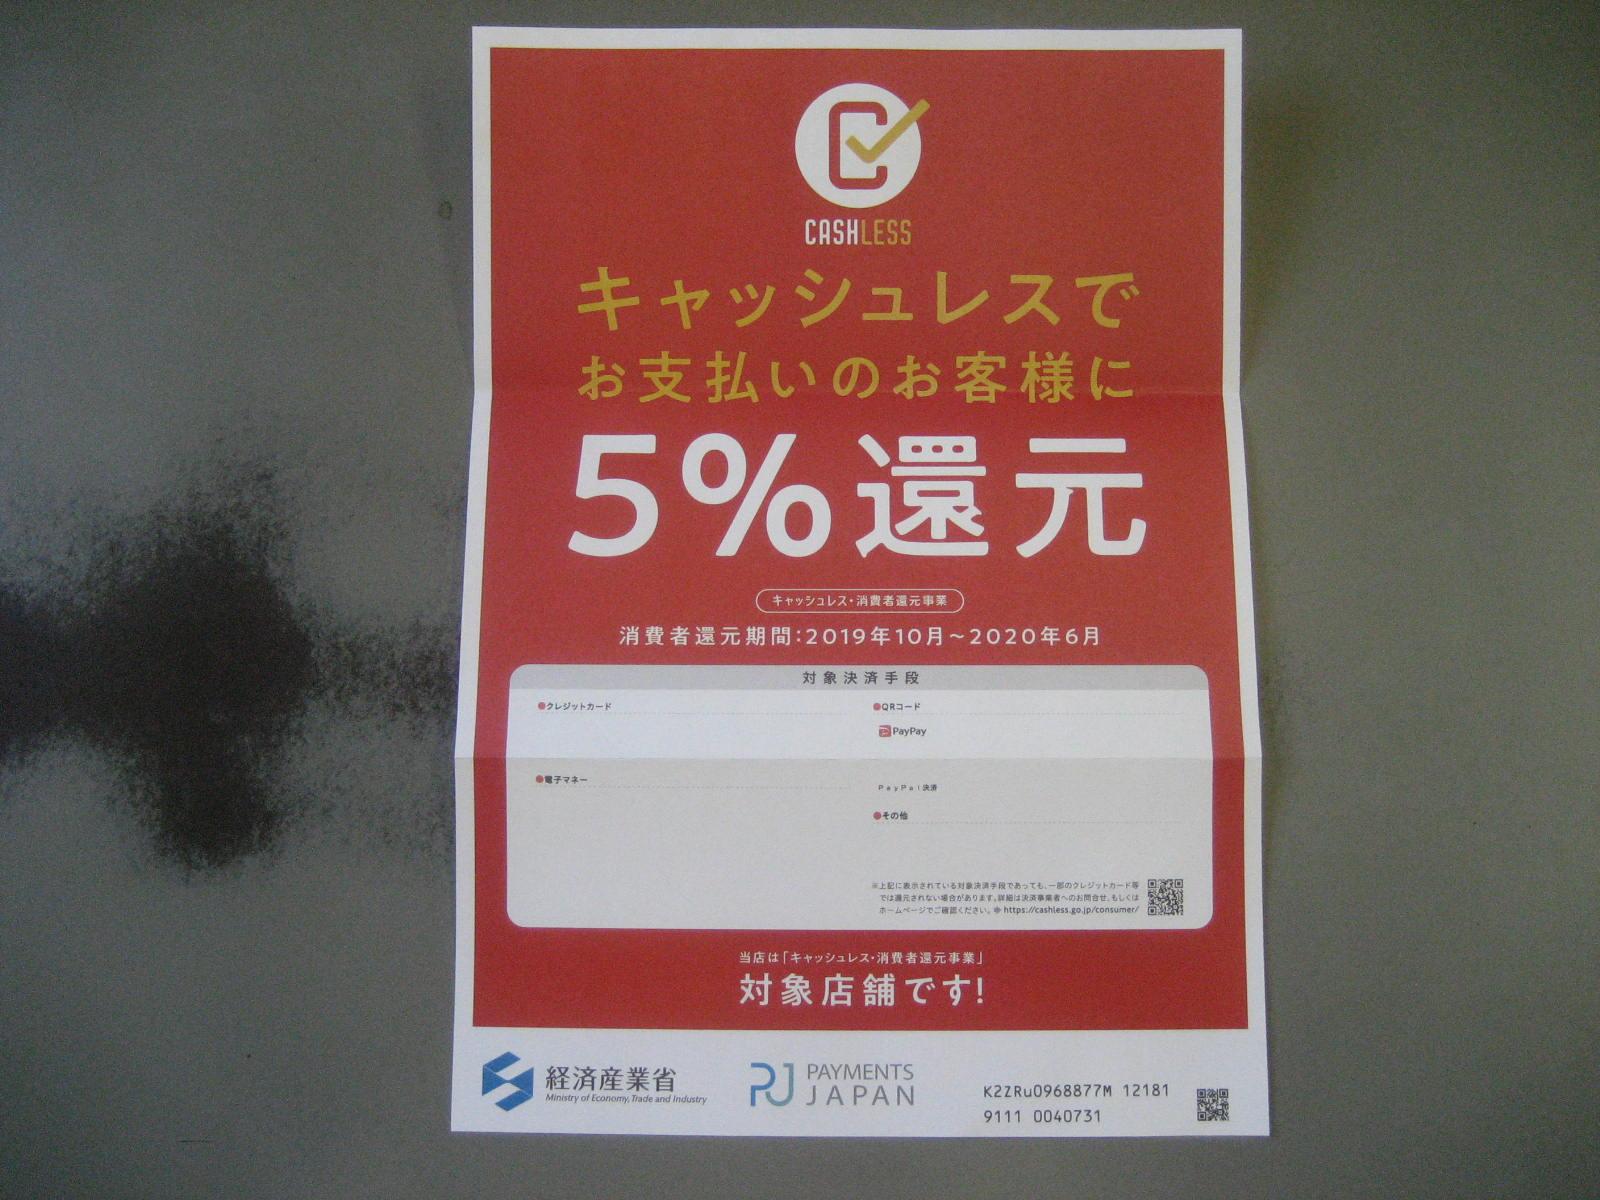 paypal消費税還元5%